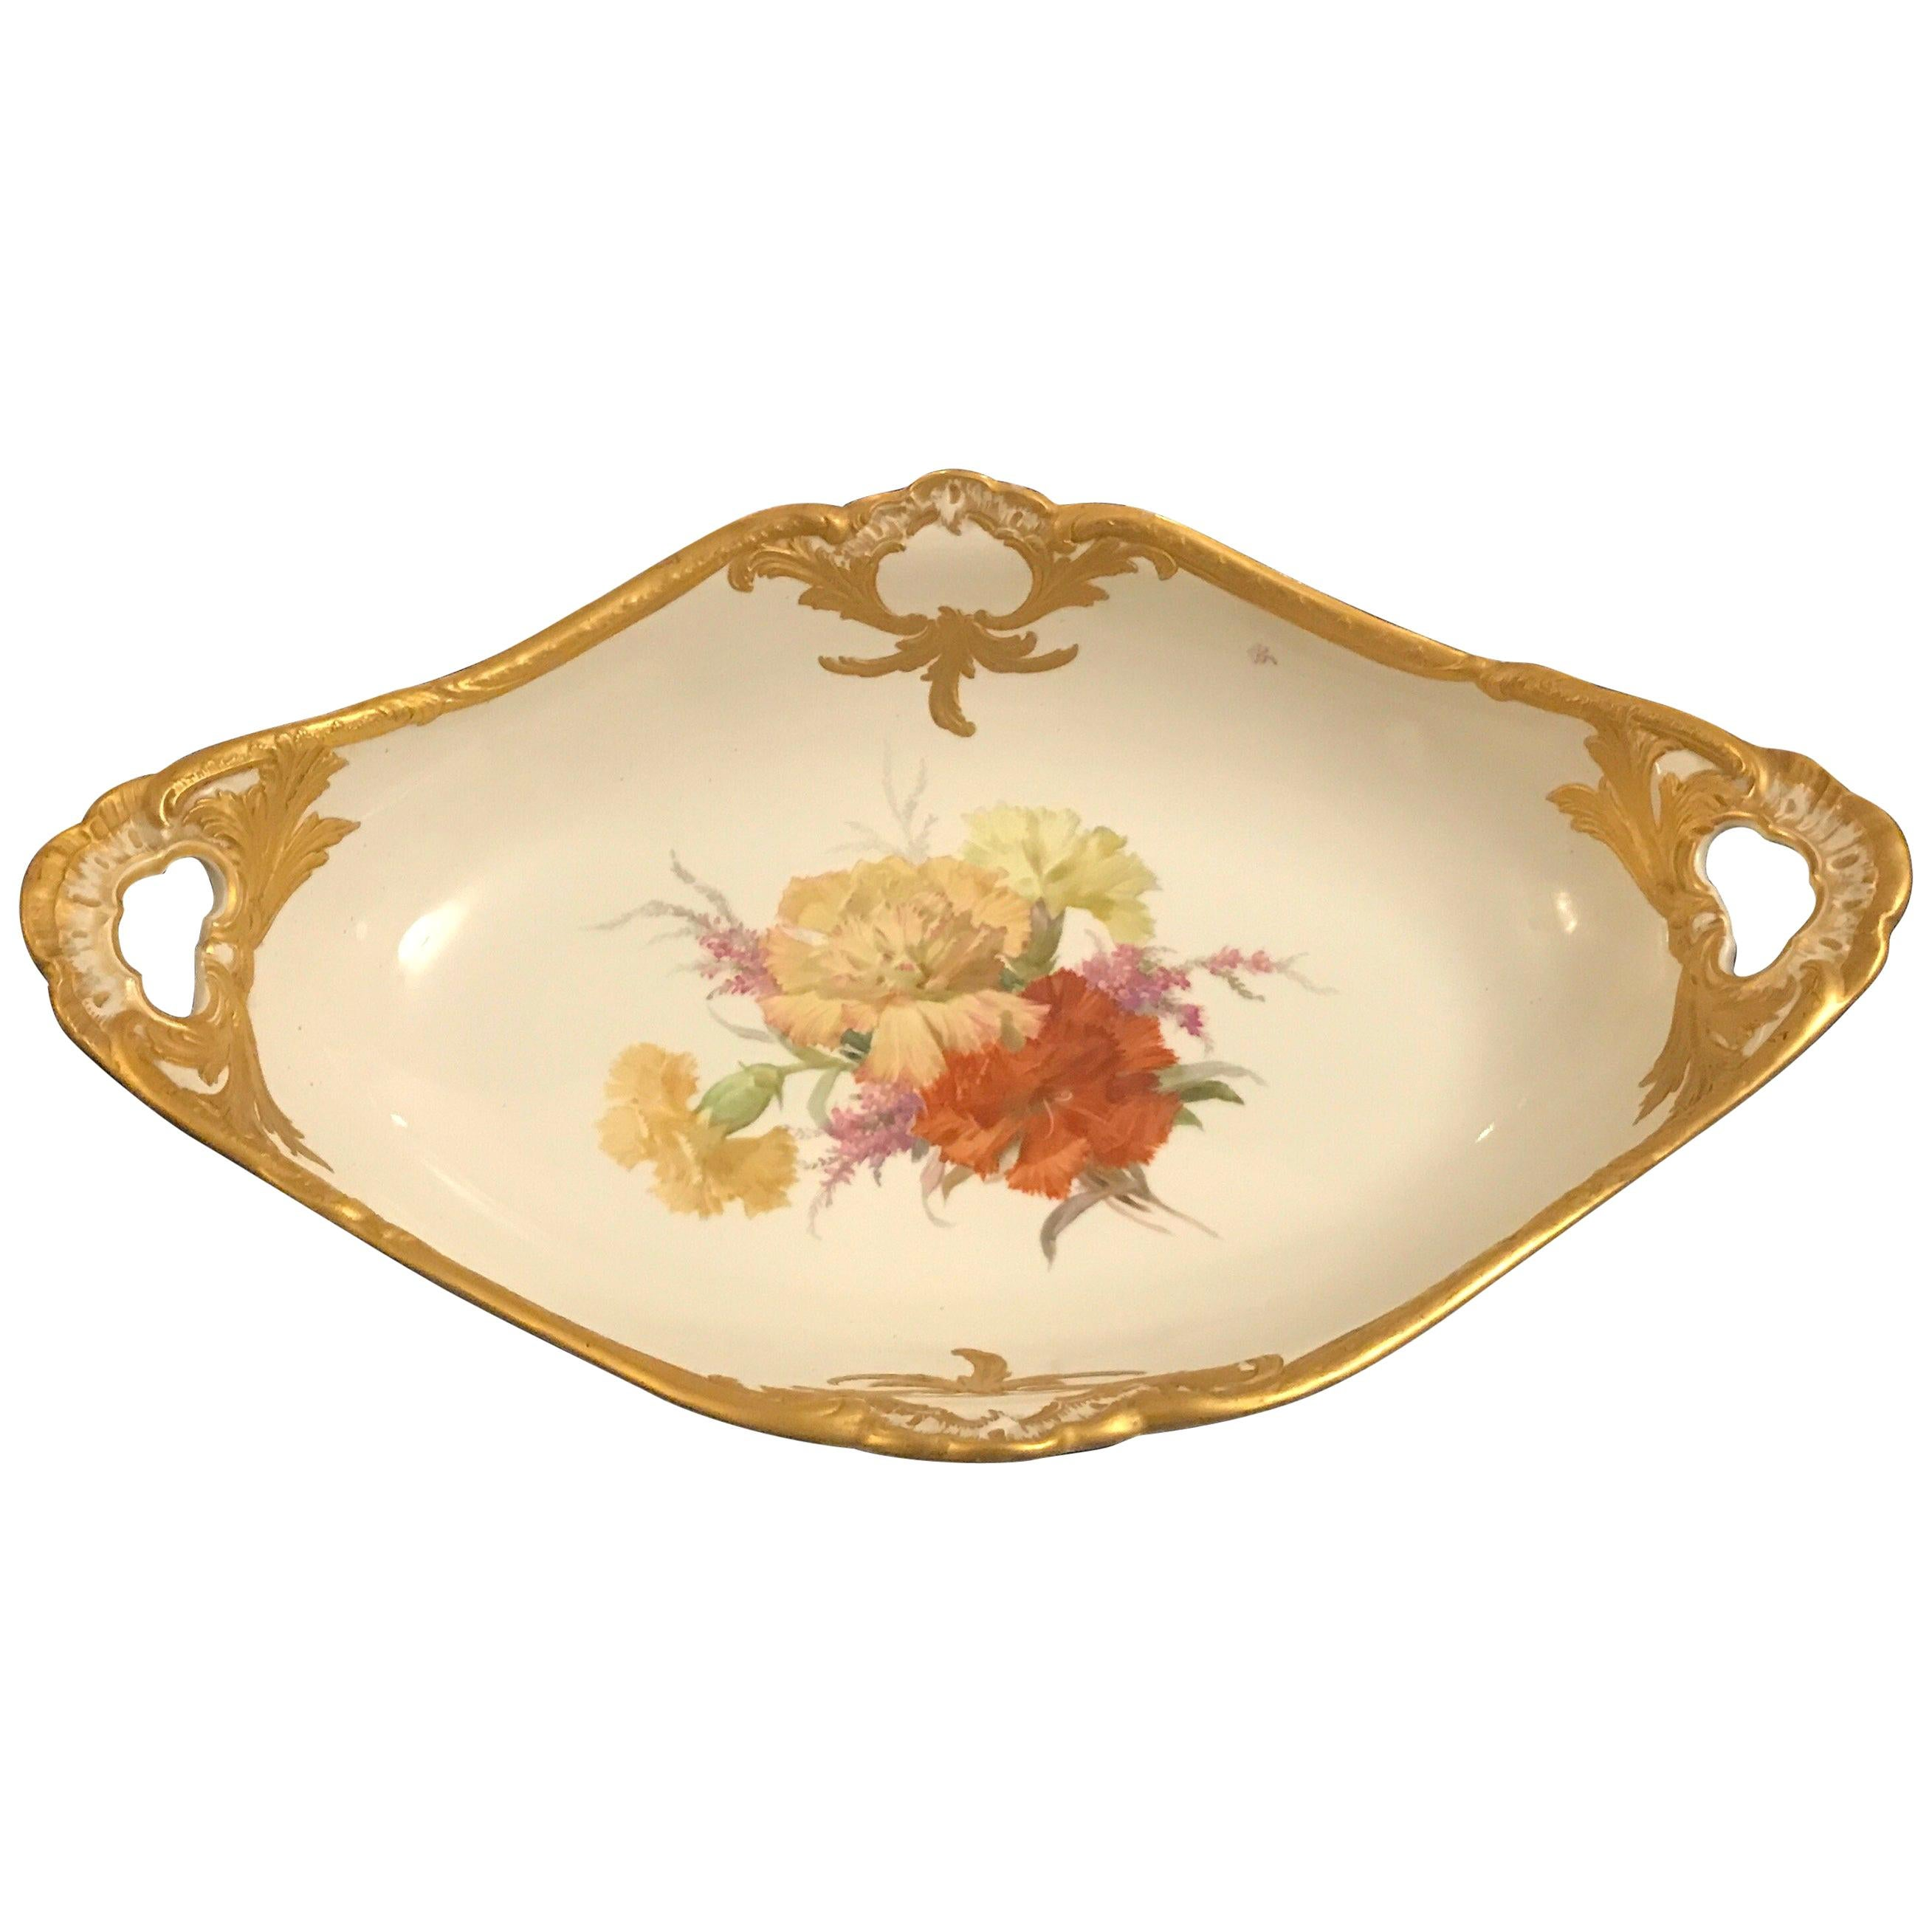 KPM Porcelain Hand Painted Oval Bowl, 19th Century